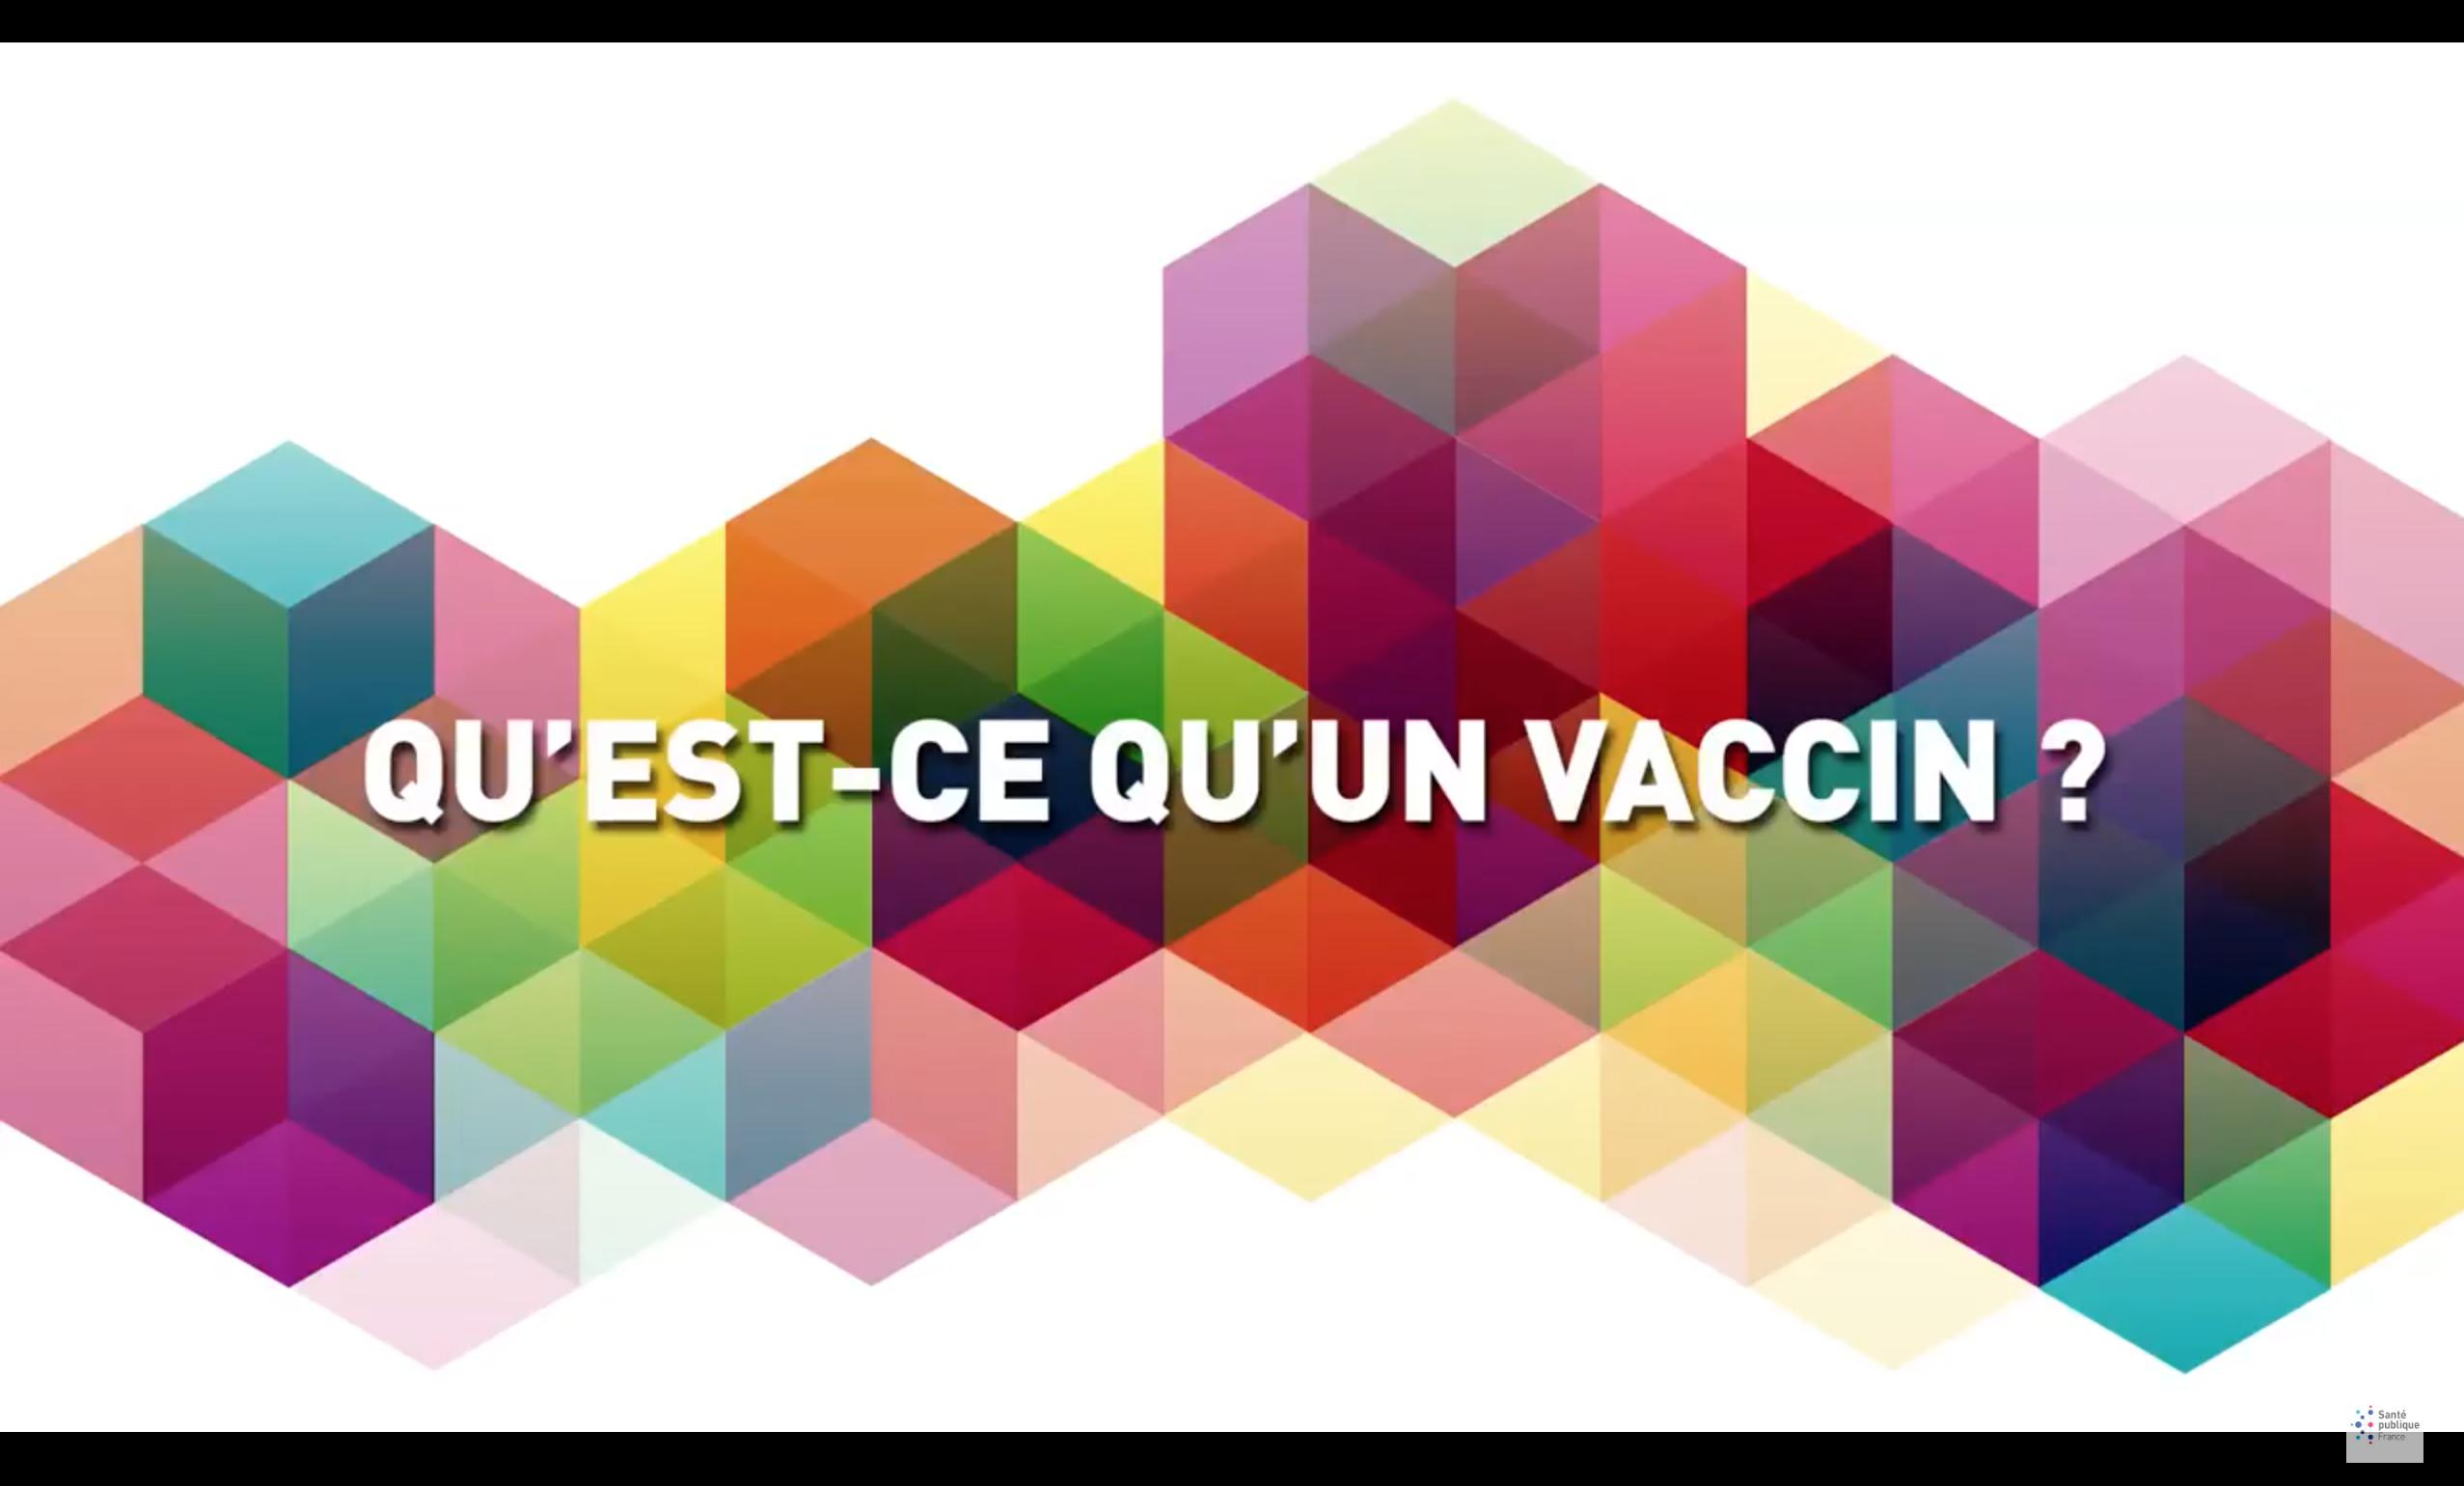 Qu'est-ce qu'un vaccin ?